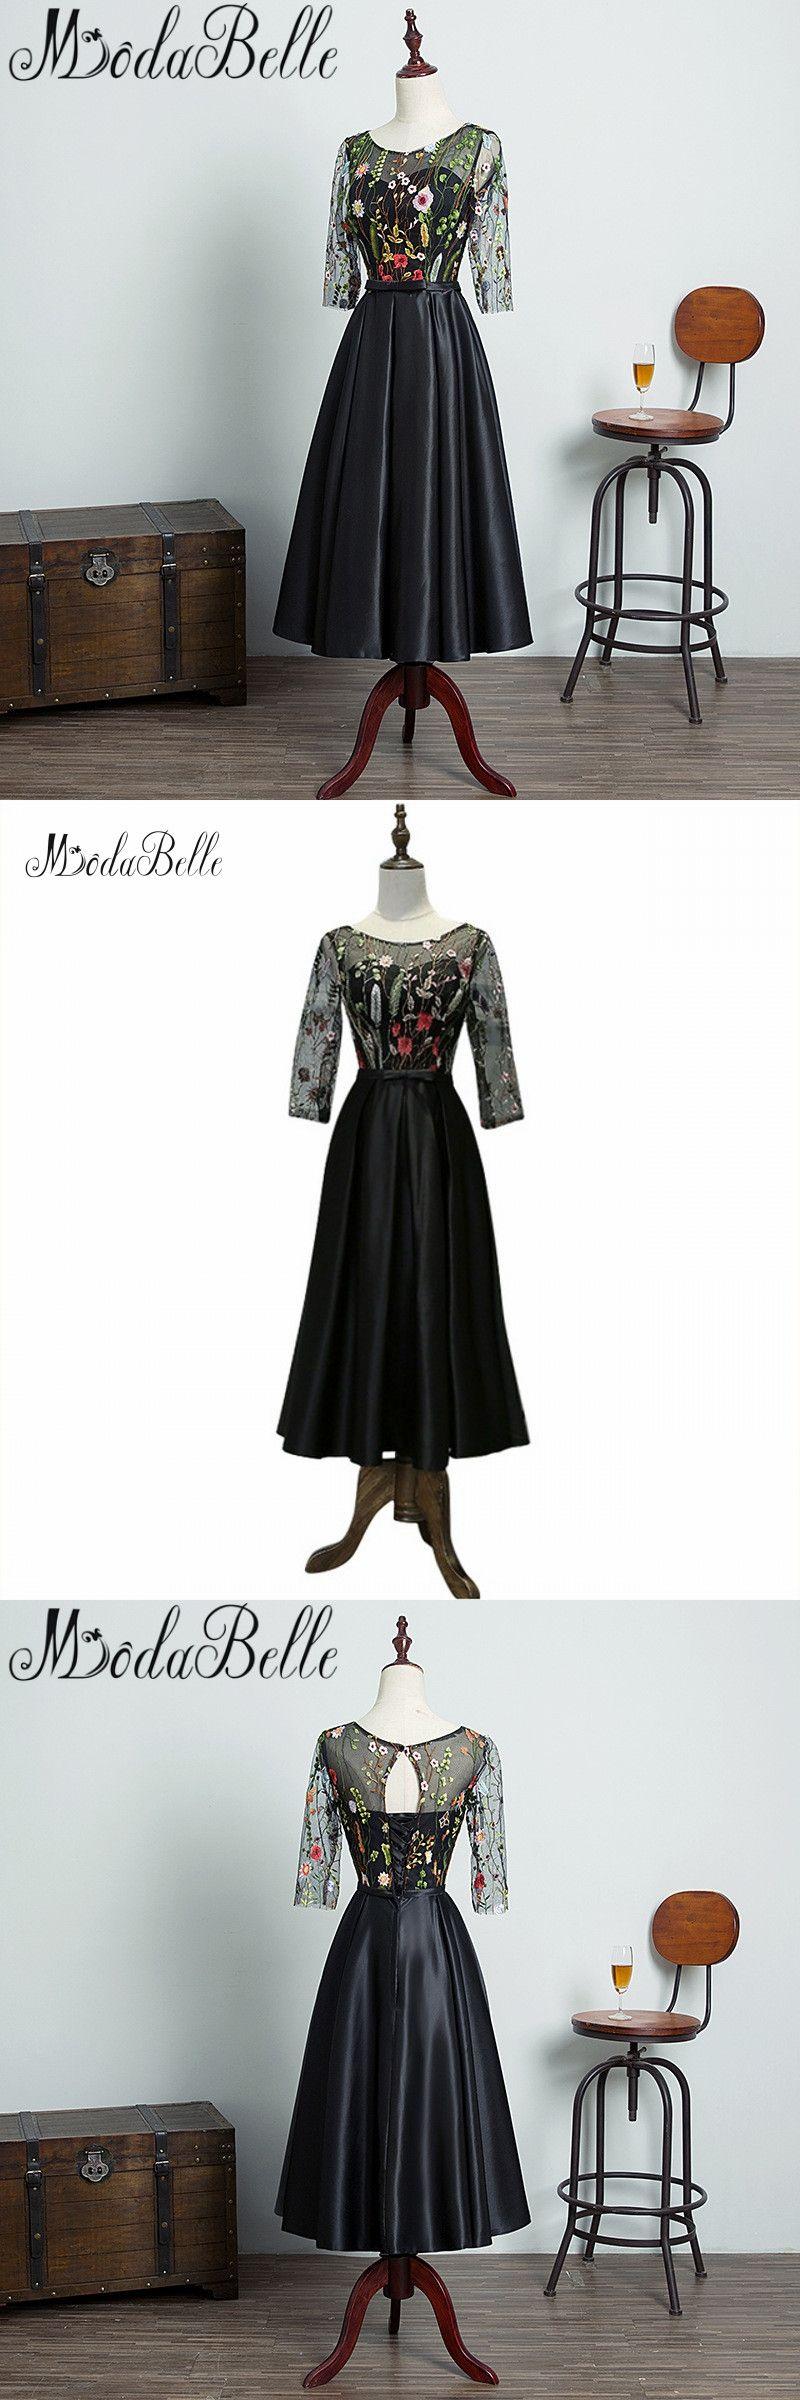 Modabelle black girls formal party dress lace short prom dresses